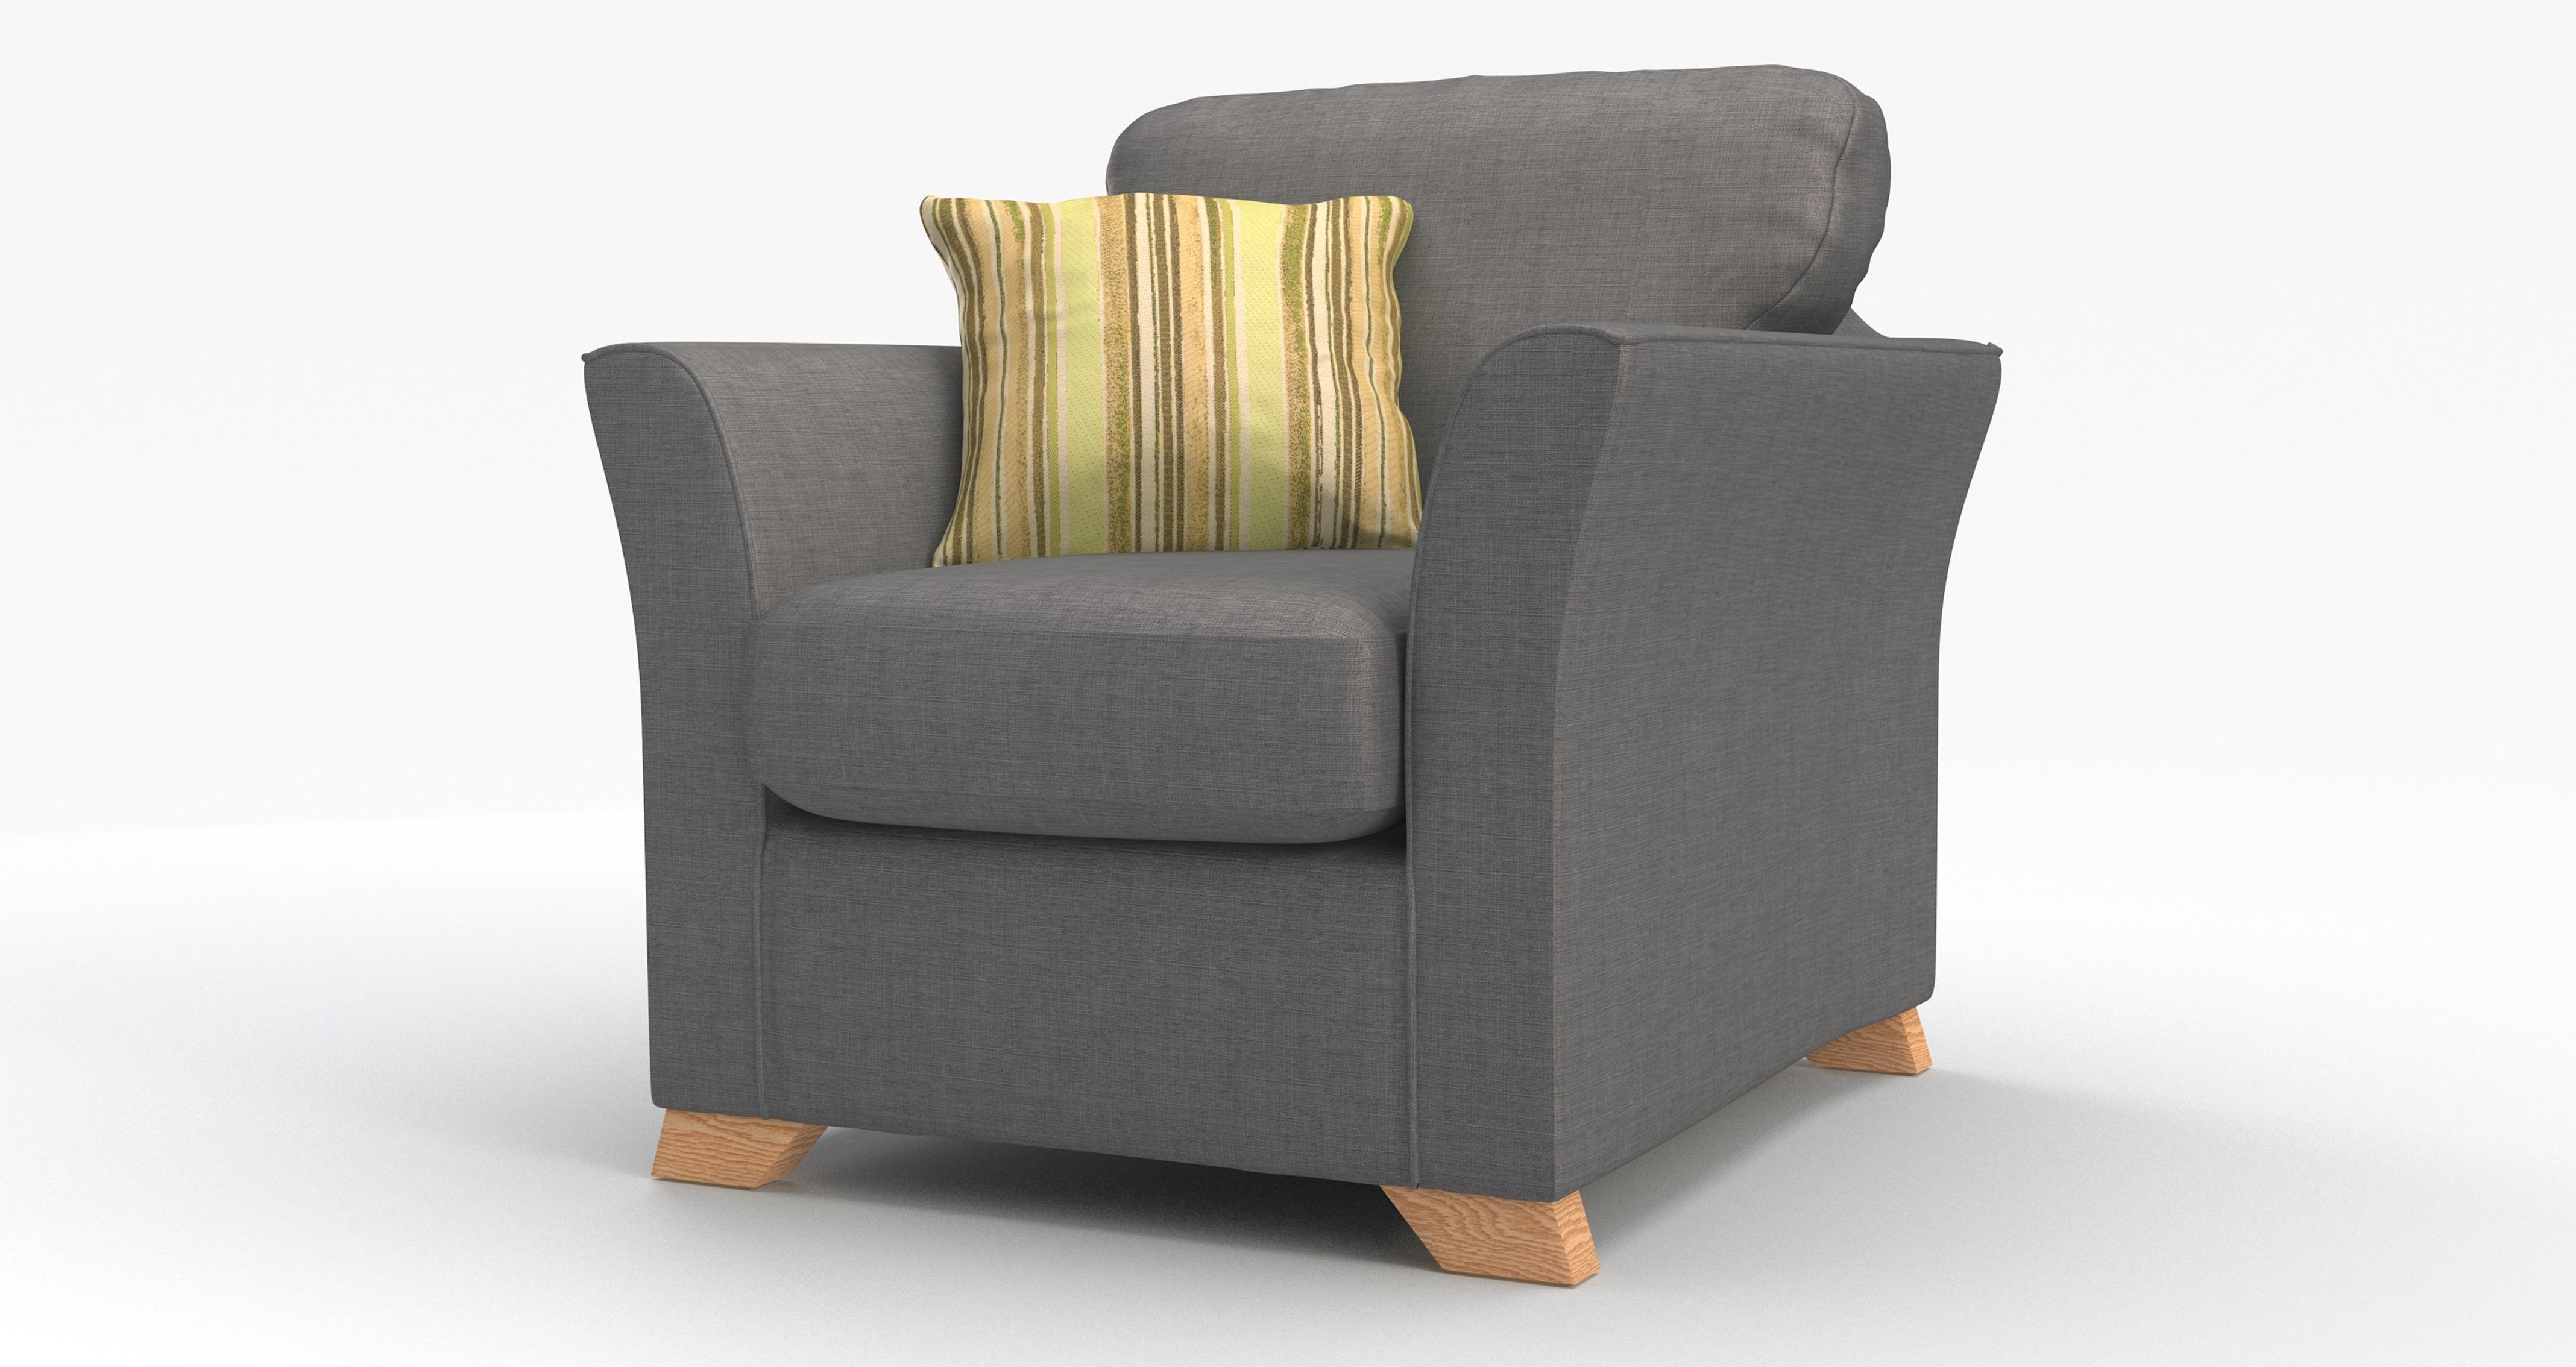 DFS Zuma Slate Fabric Range - 3 Seater, 2 Str, Sofa Bed ...